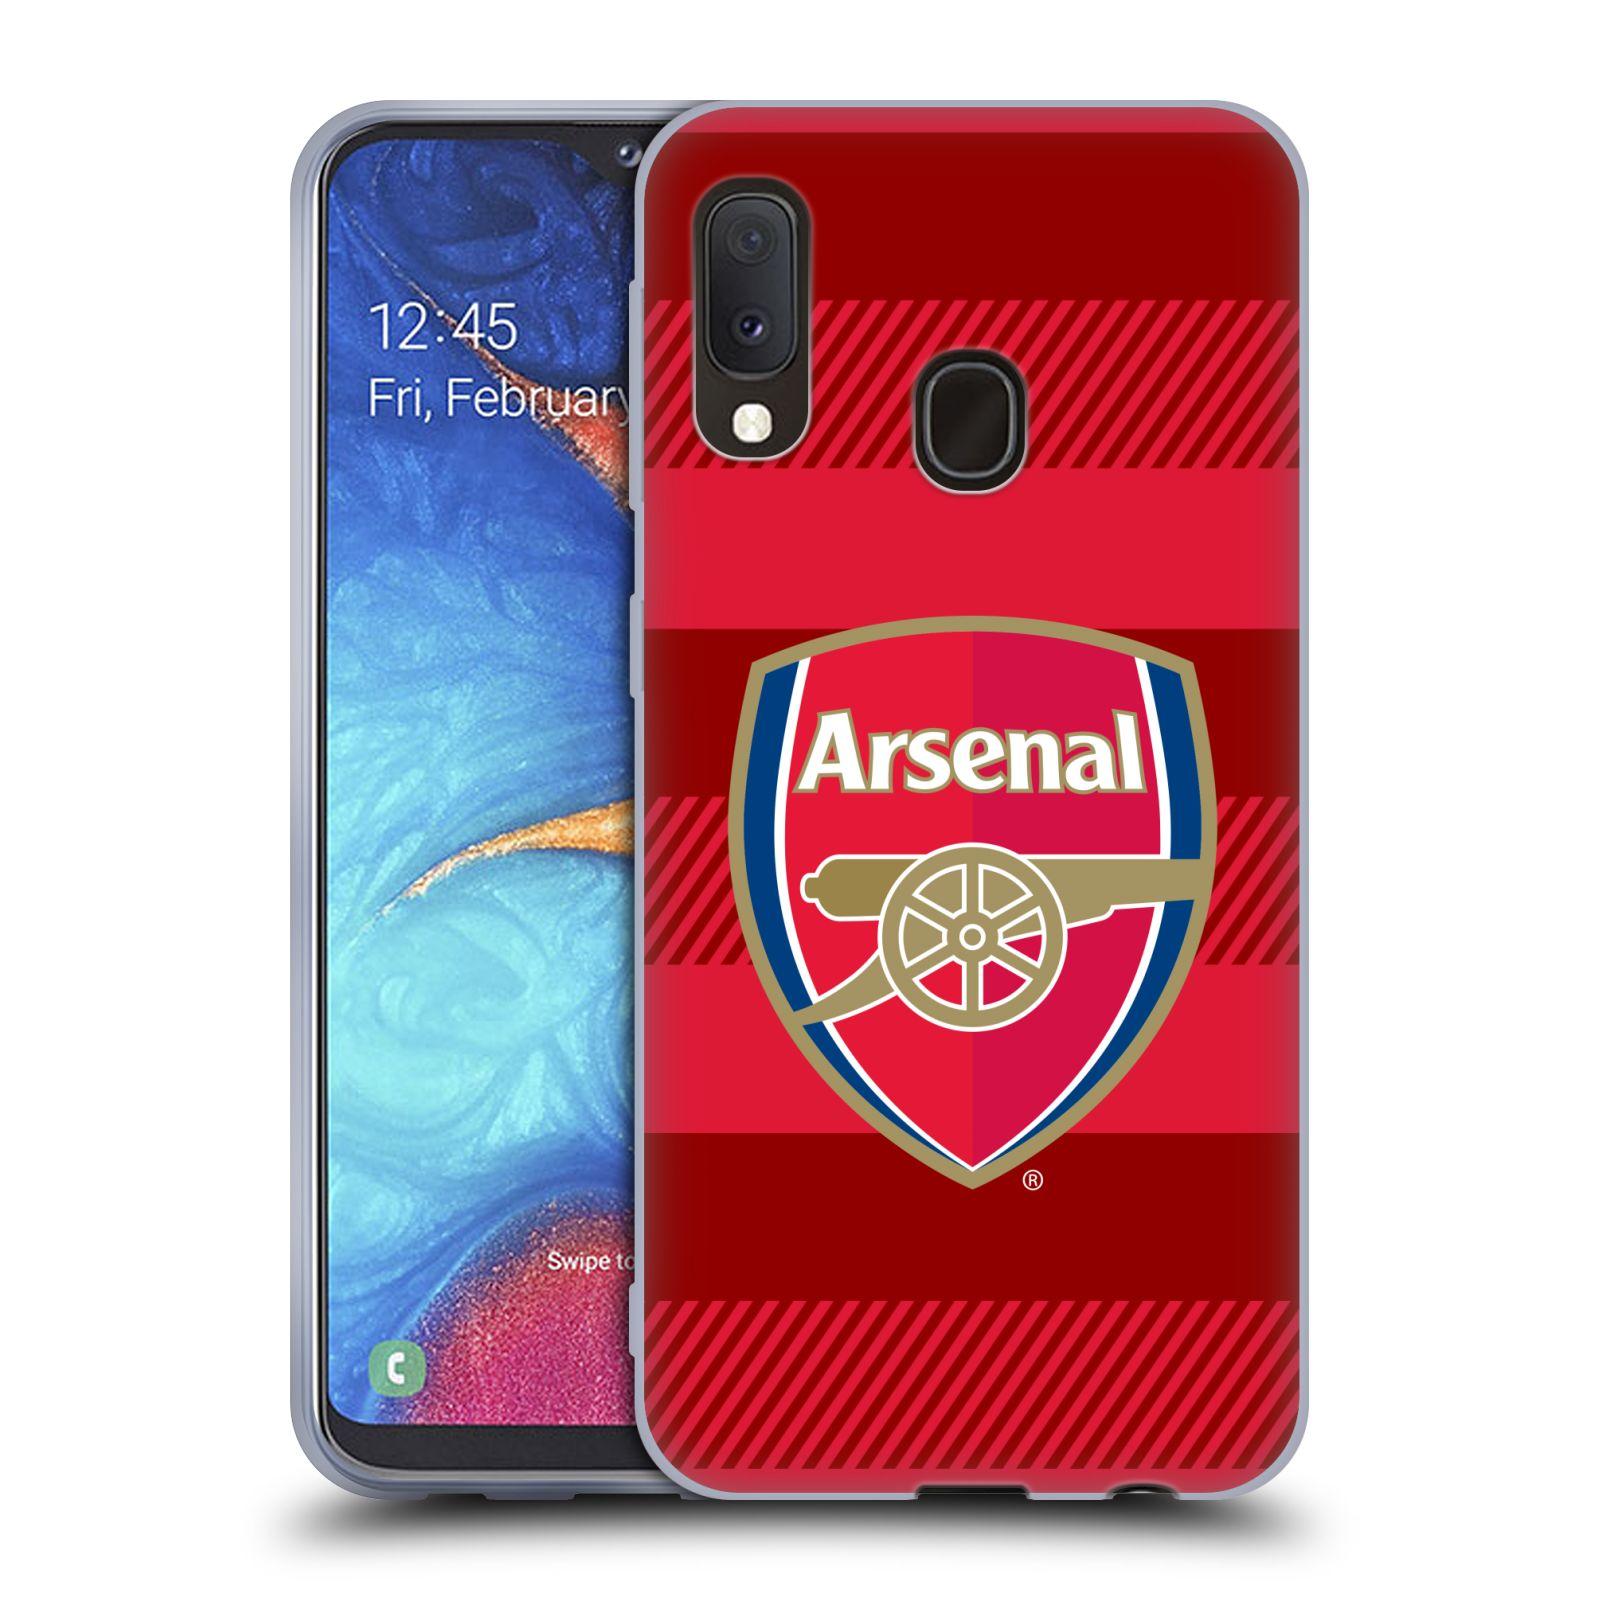 Silikonové pouzdro na mobil Samsung Galaxy A20e - Head Case - Arsenal FC - Logo s pruhy